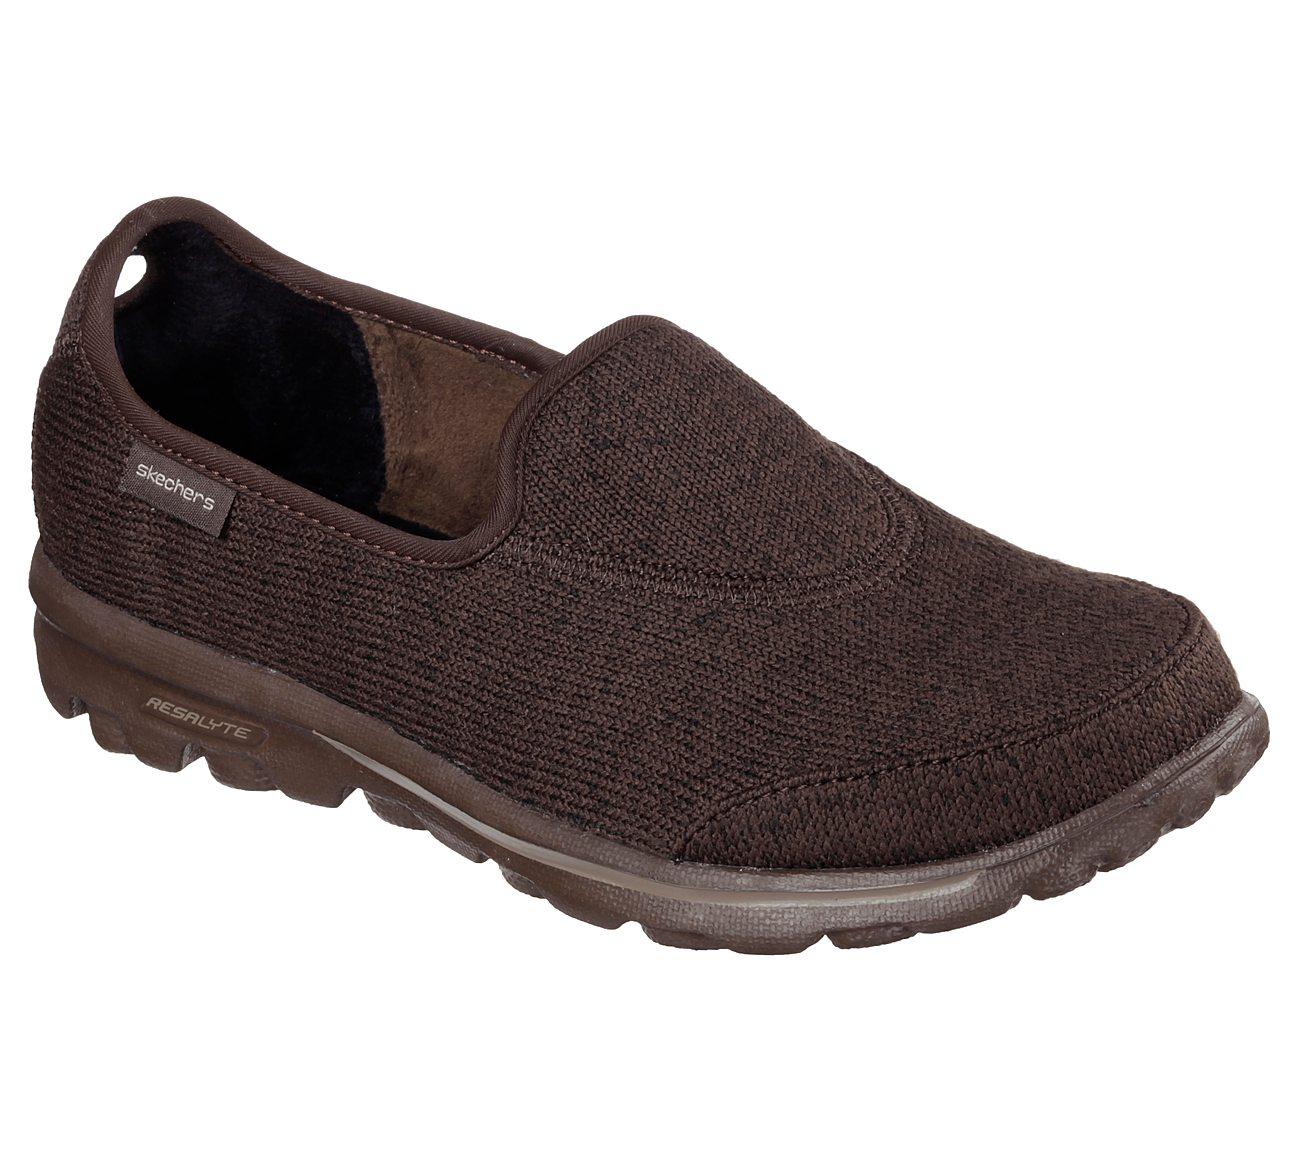 Skechers GOwalk Stitch